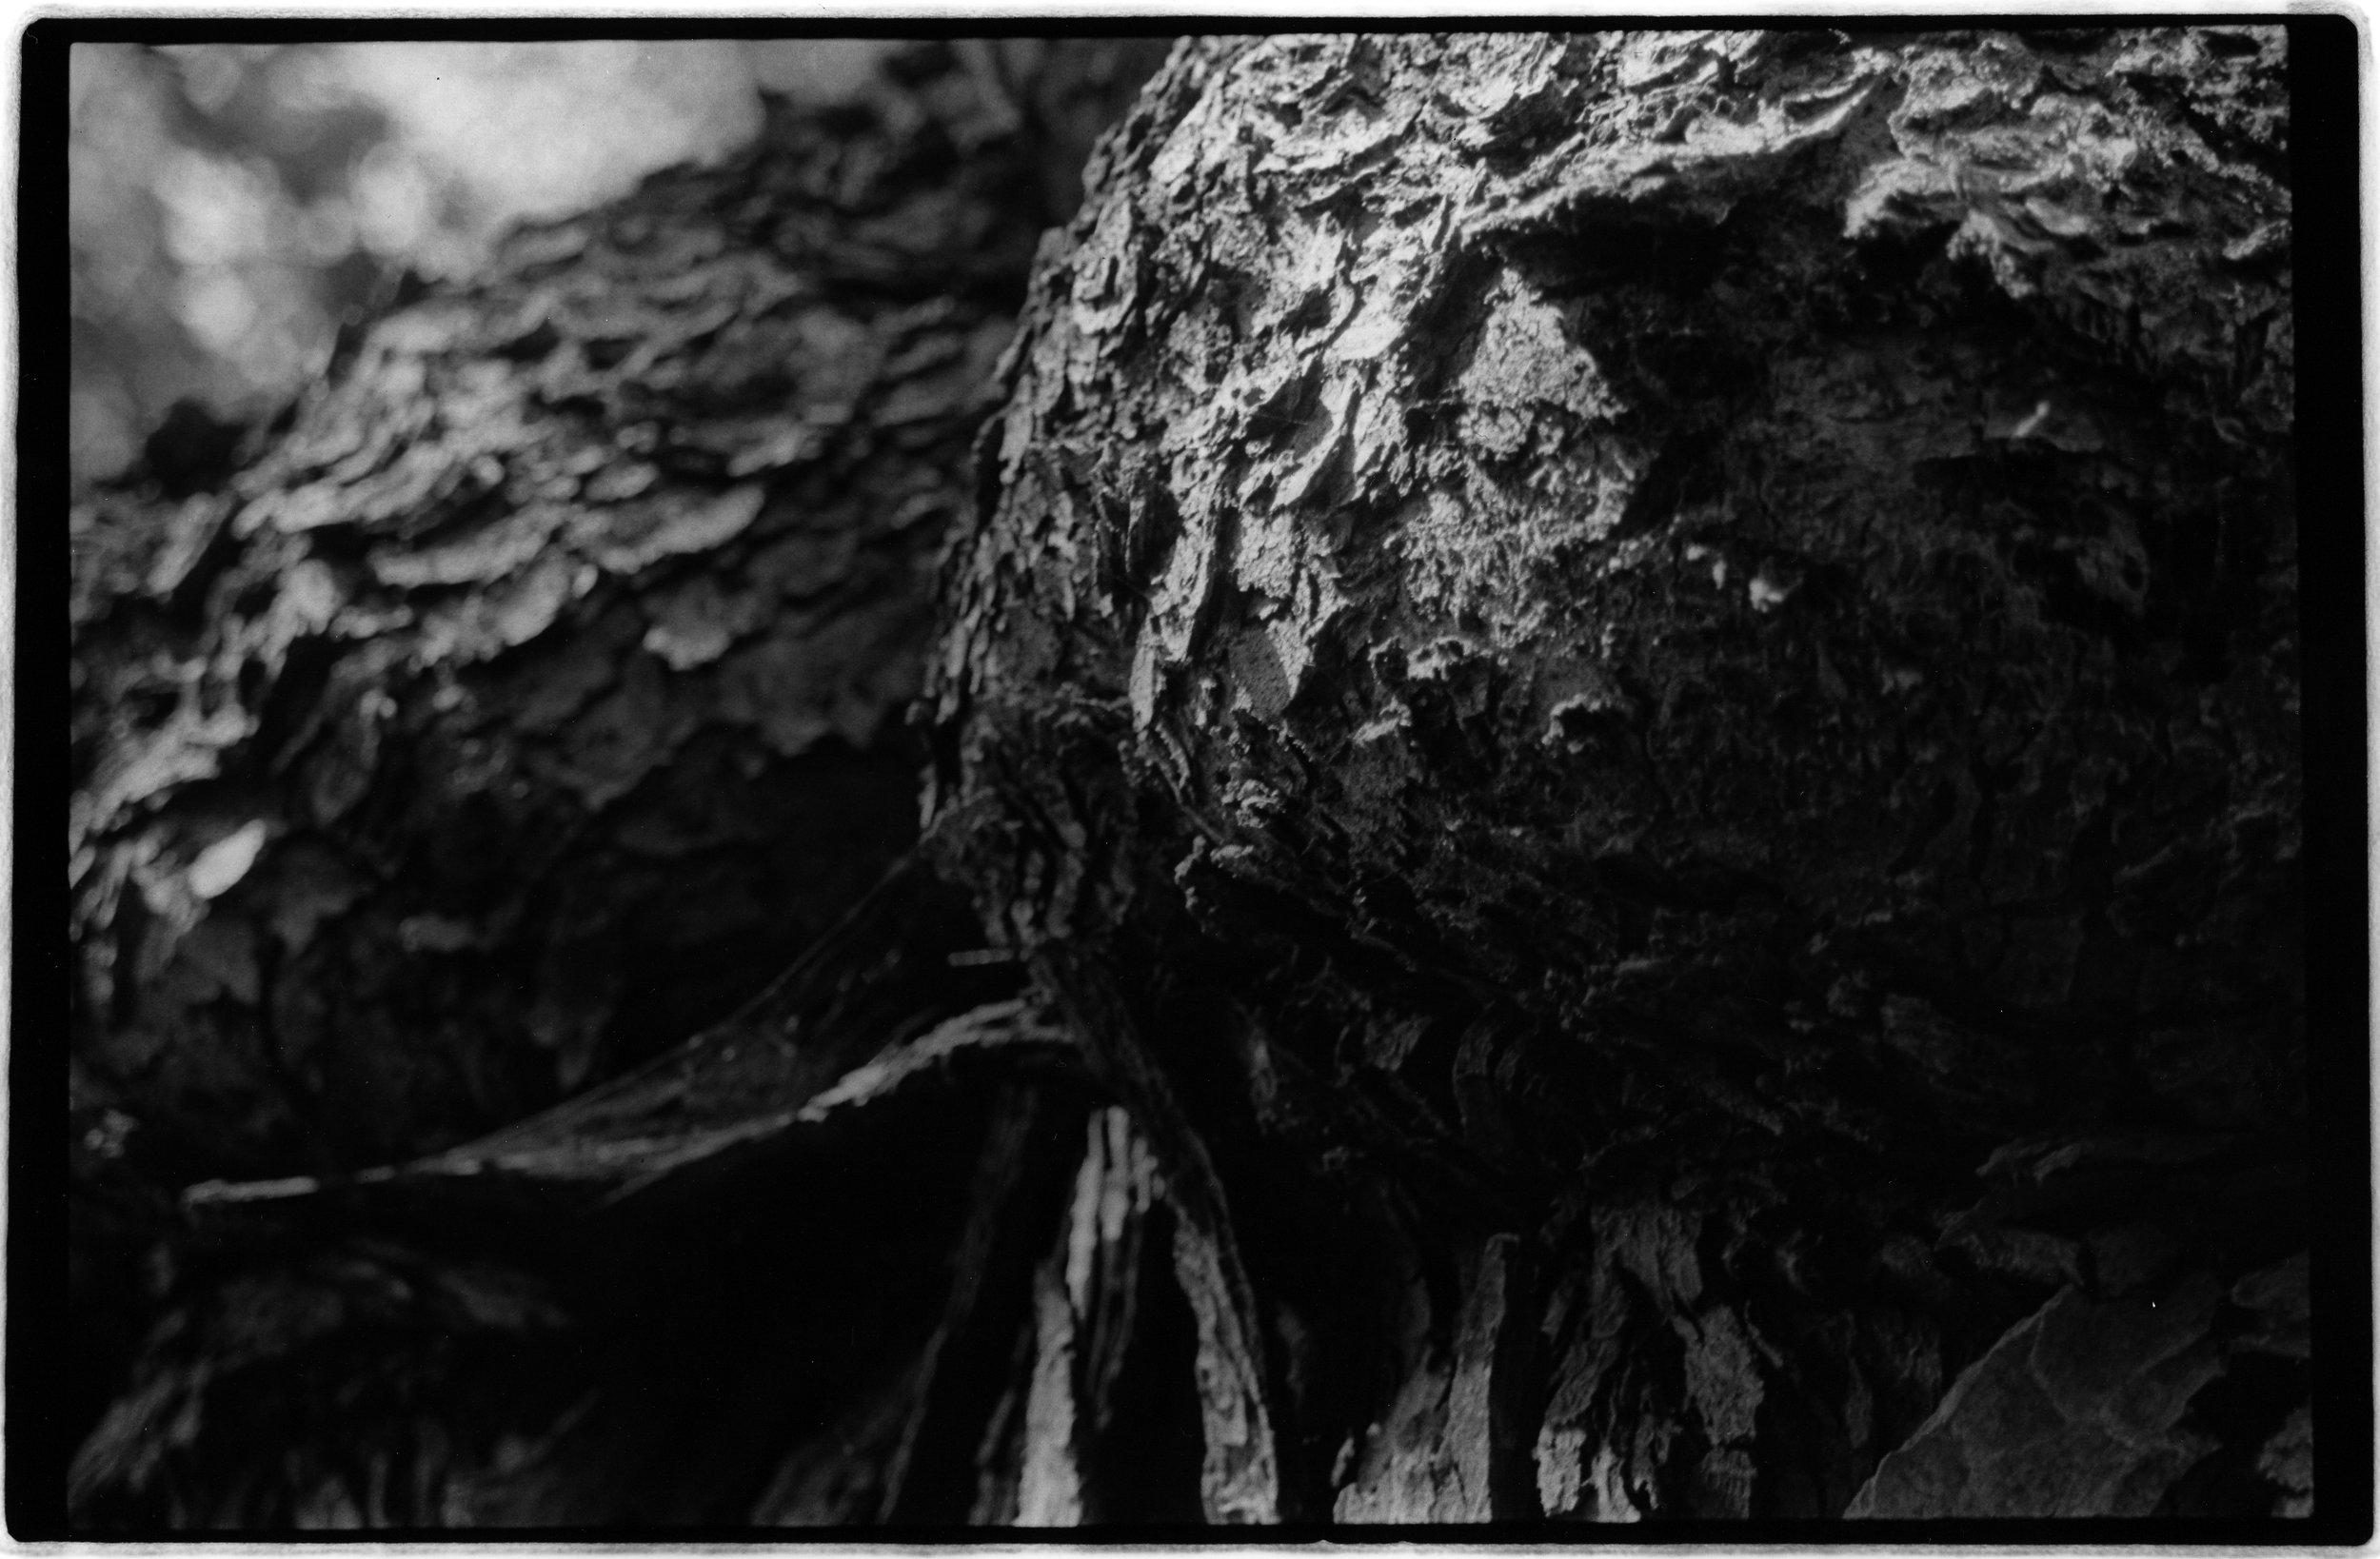 Tree Boils202.jpg